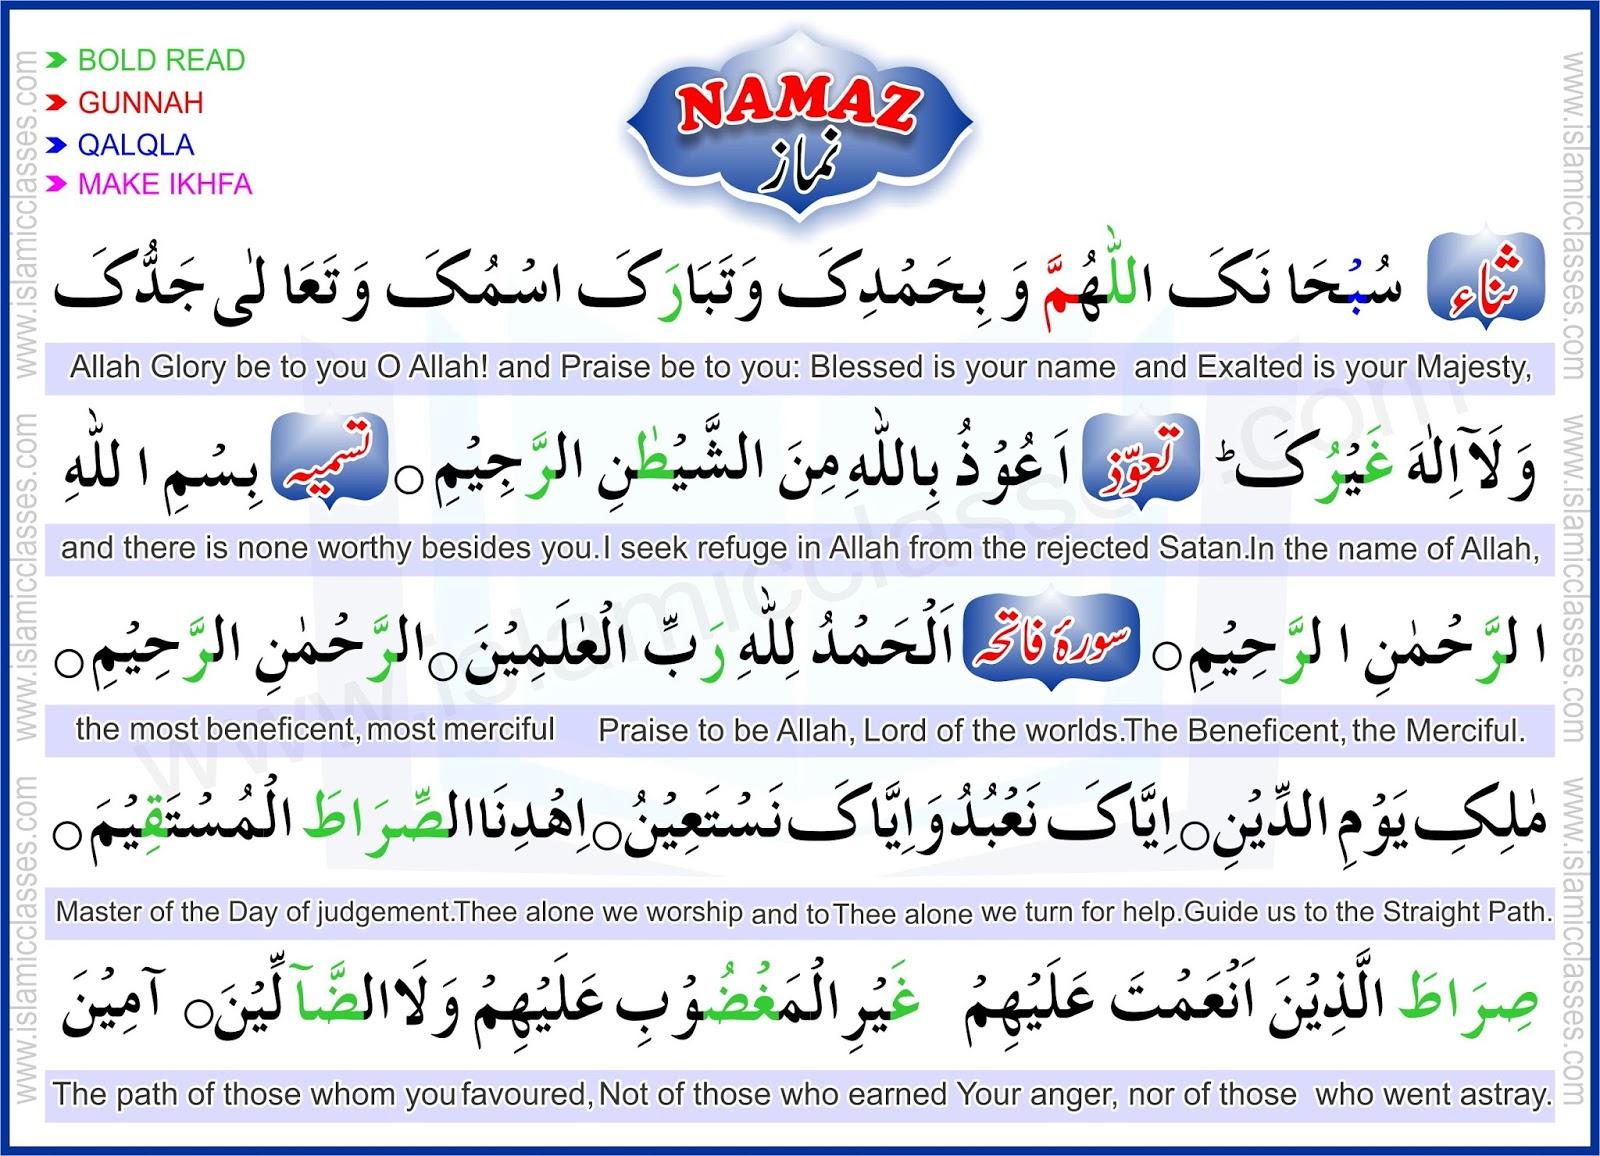 Namaz reading to learn